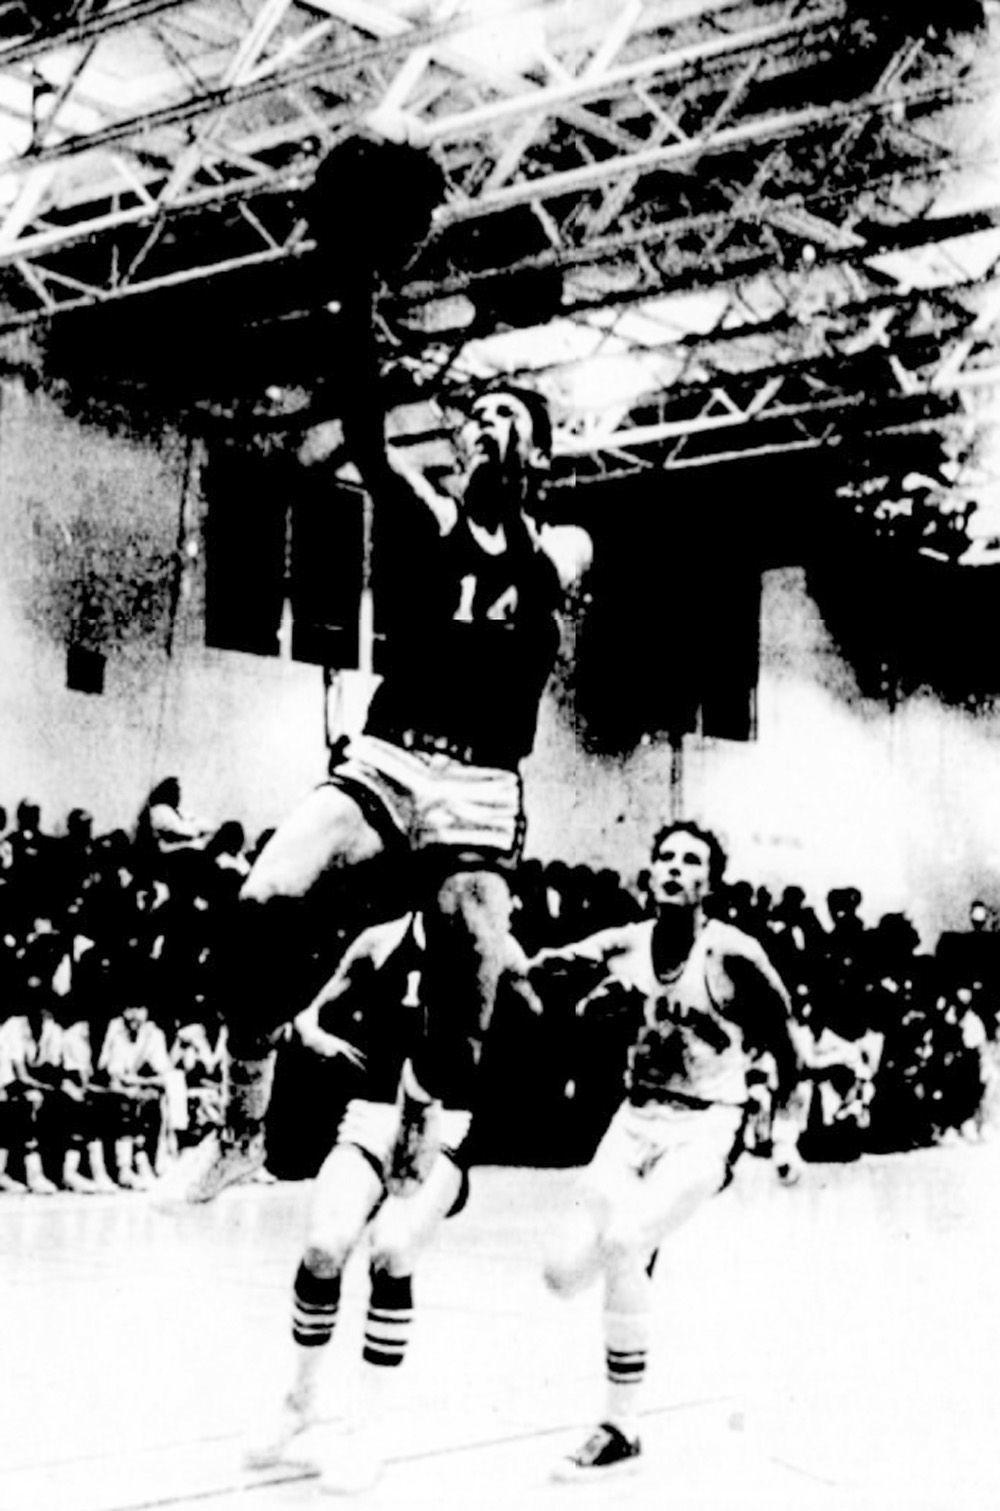 082219 basketball 50 years ago 2